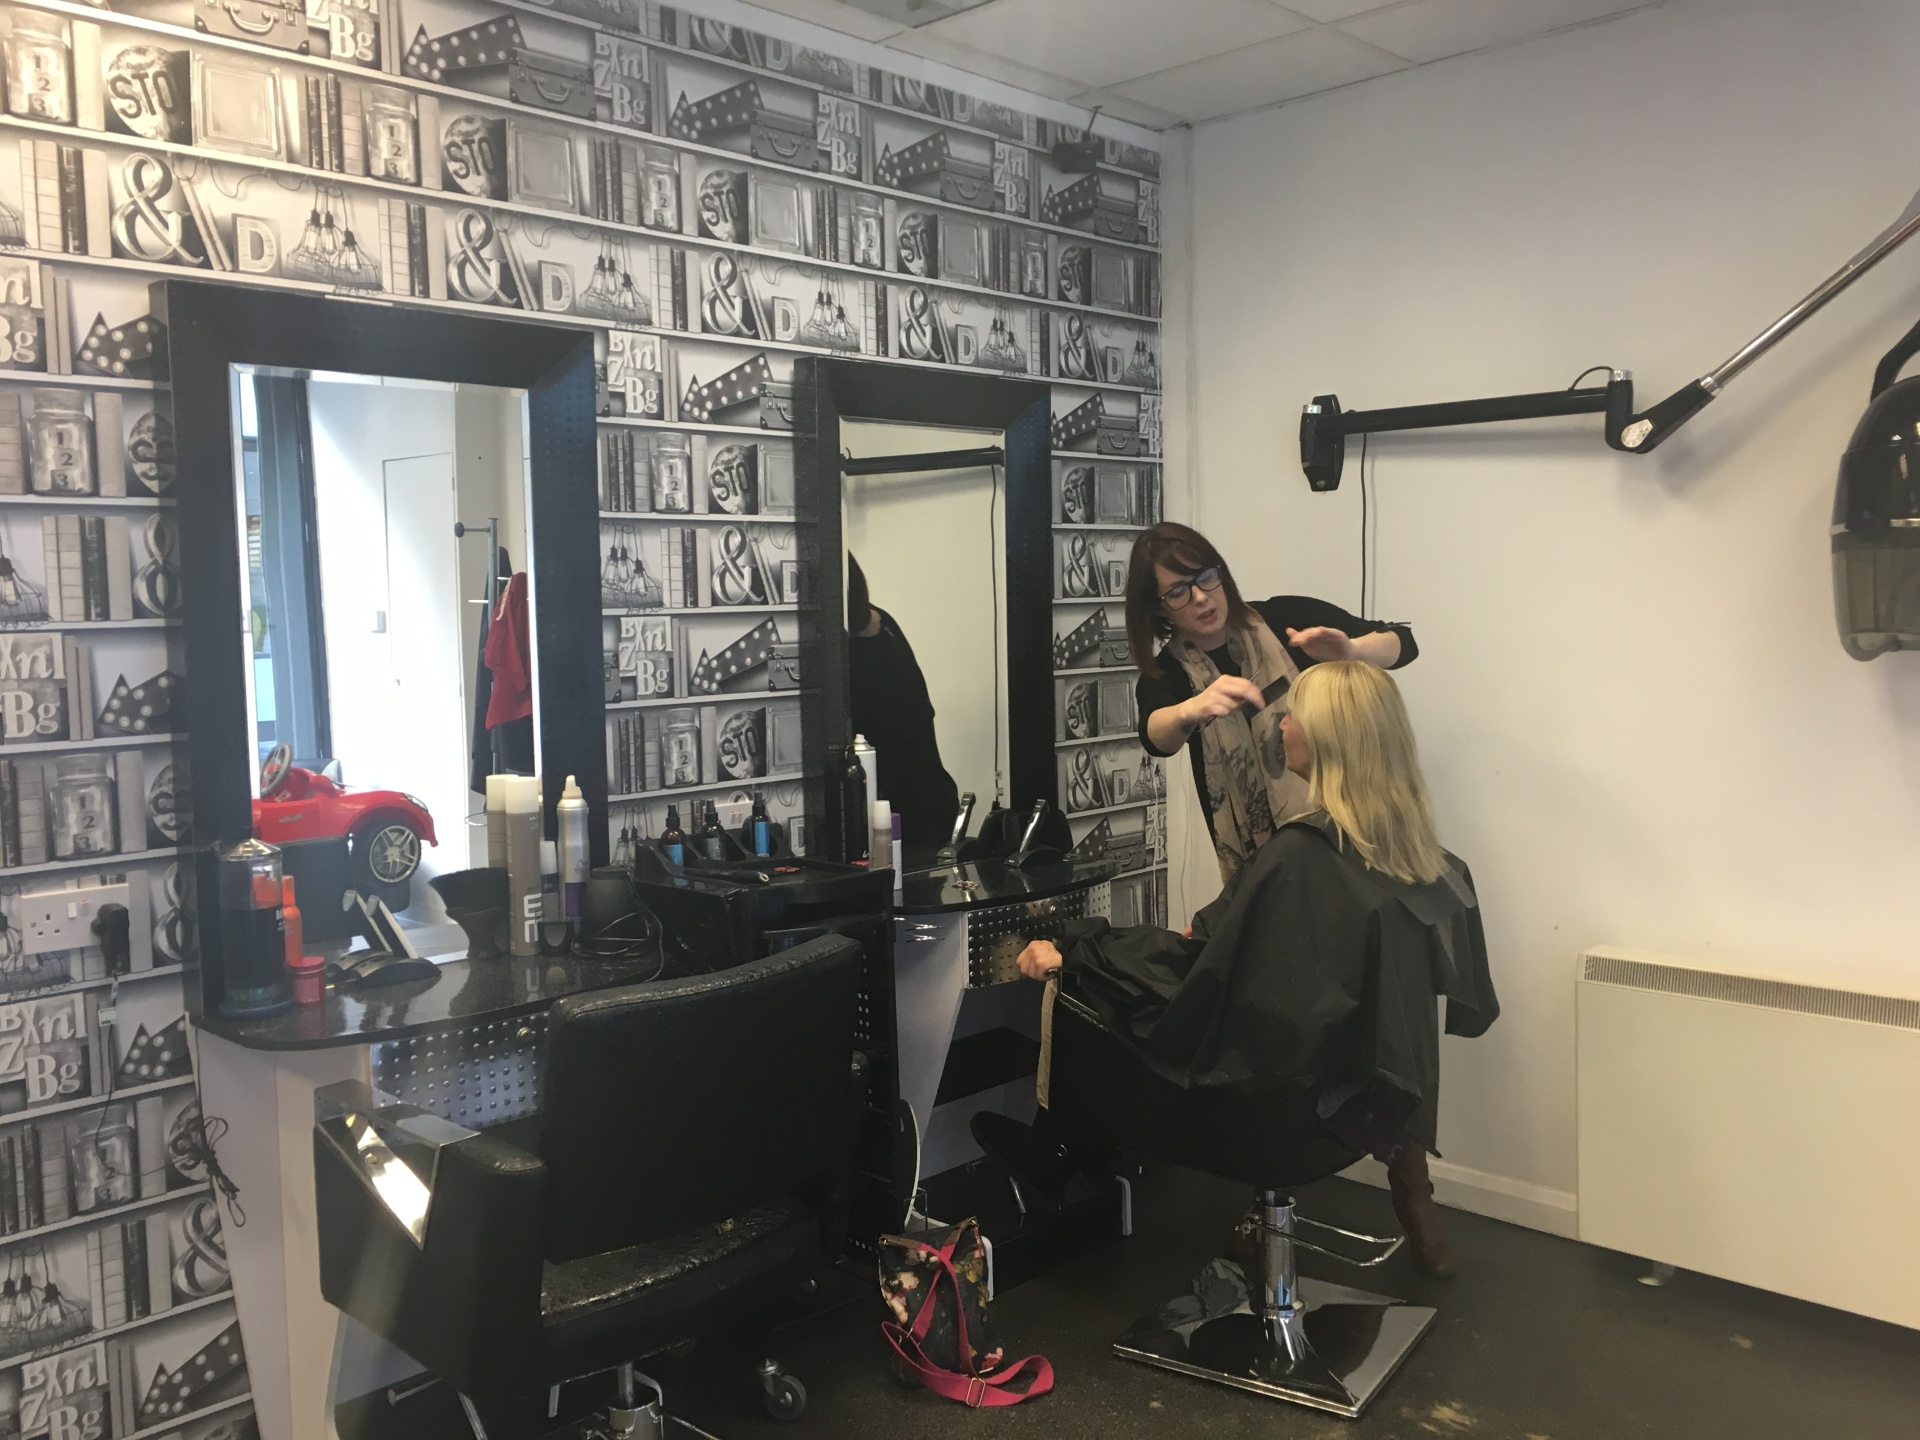 hair-wash, basin, limelight, beauty, products